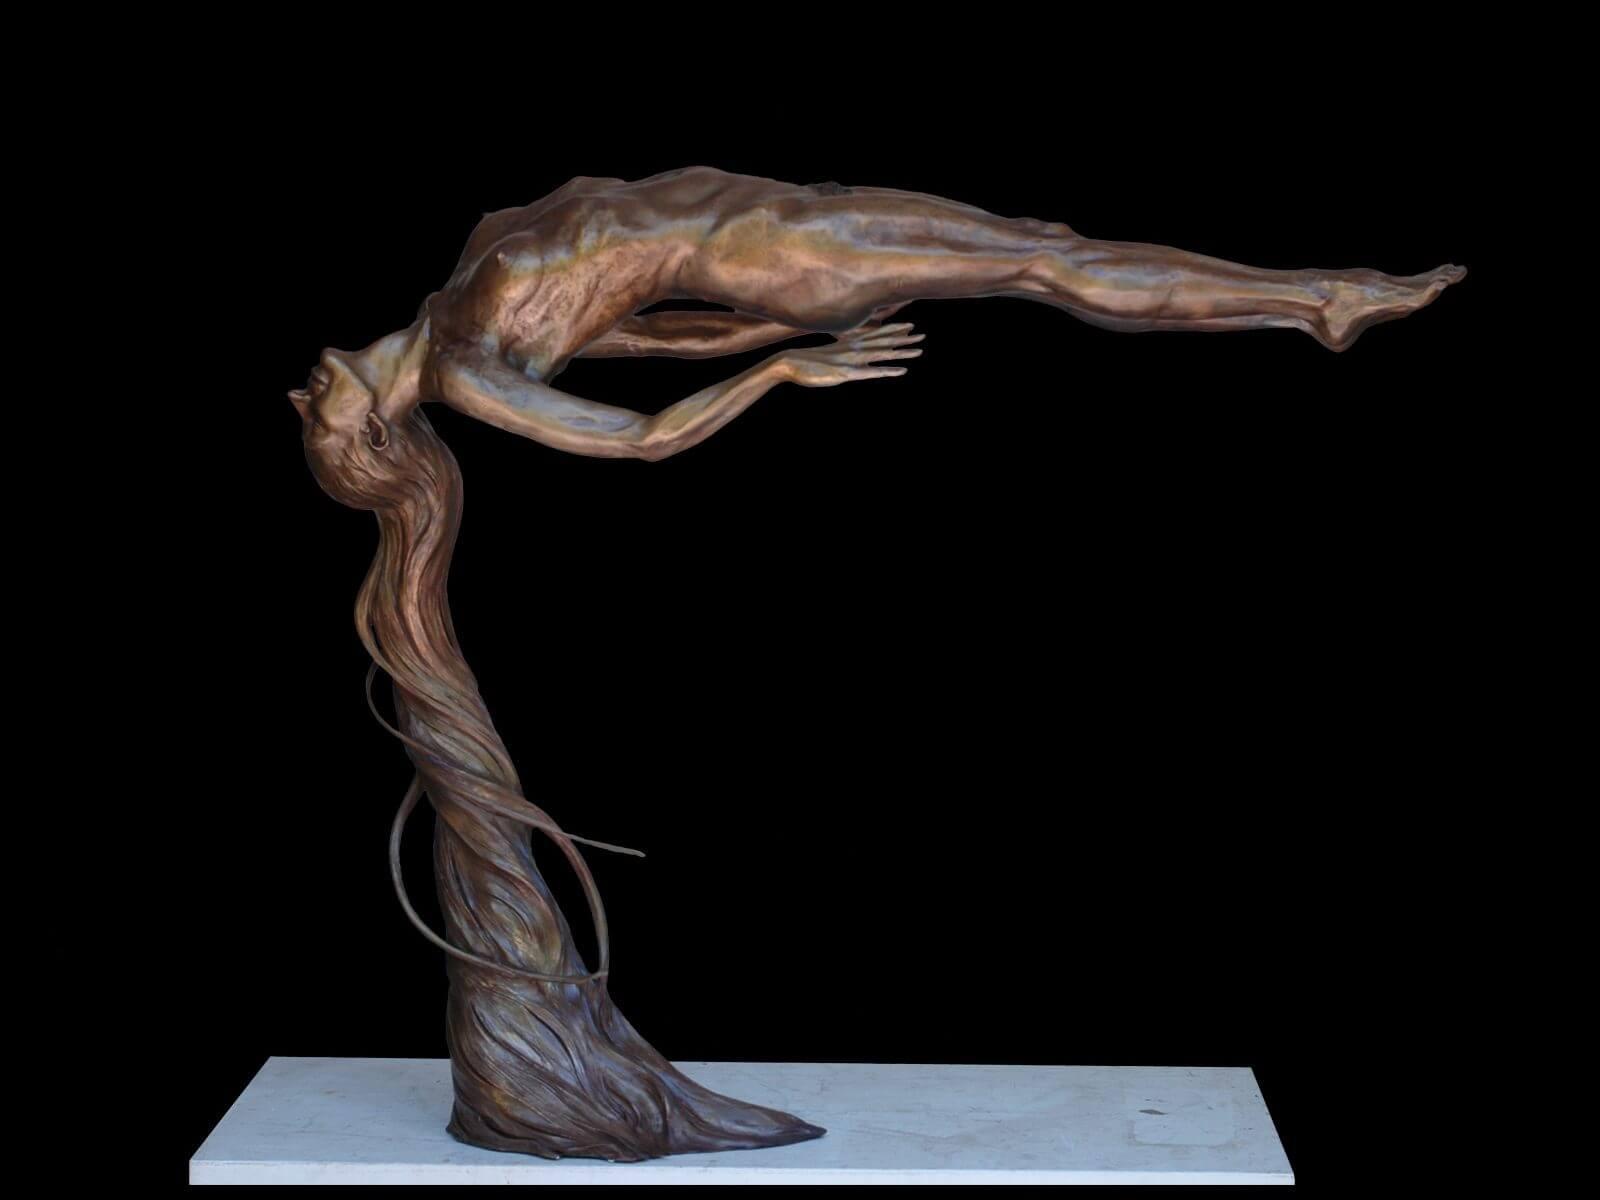 Innocence a figurative bronze sculpture by sculptor Andrew DeVries